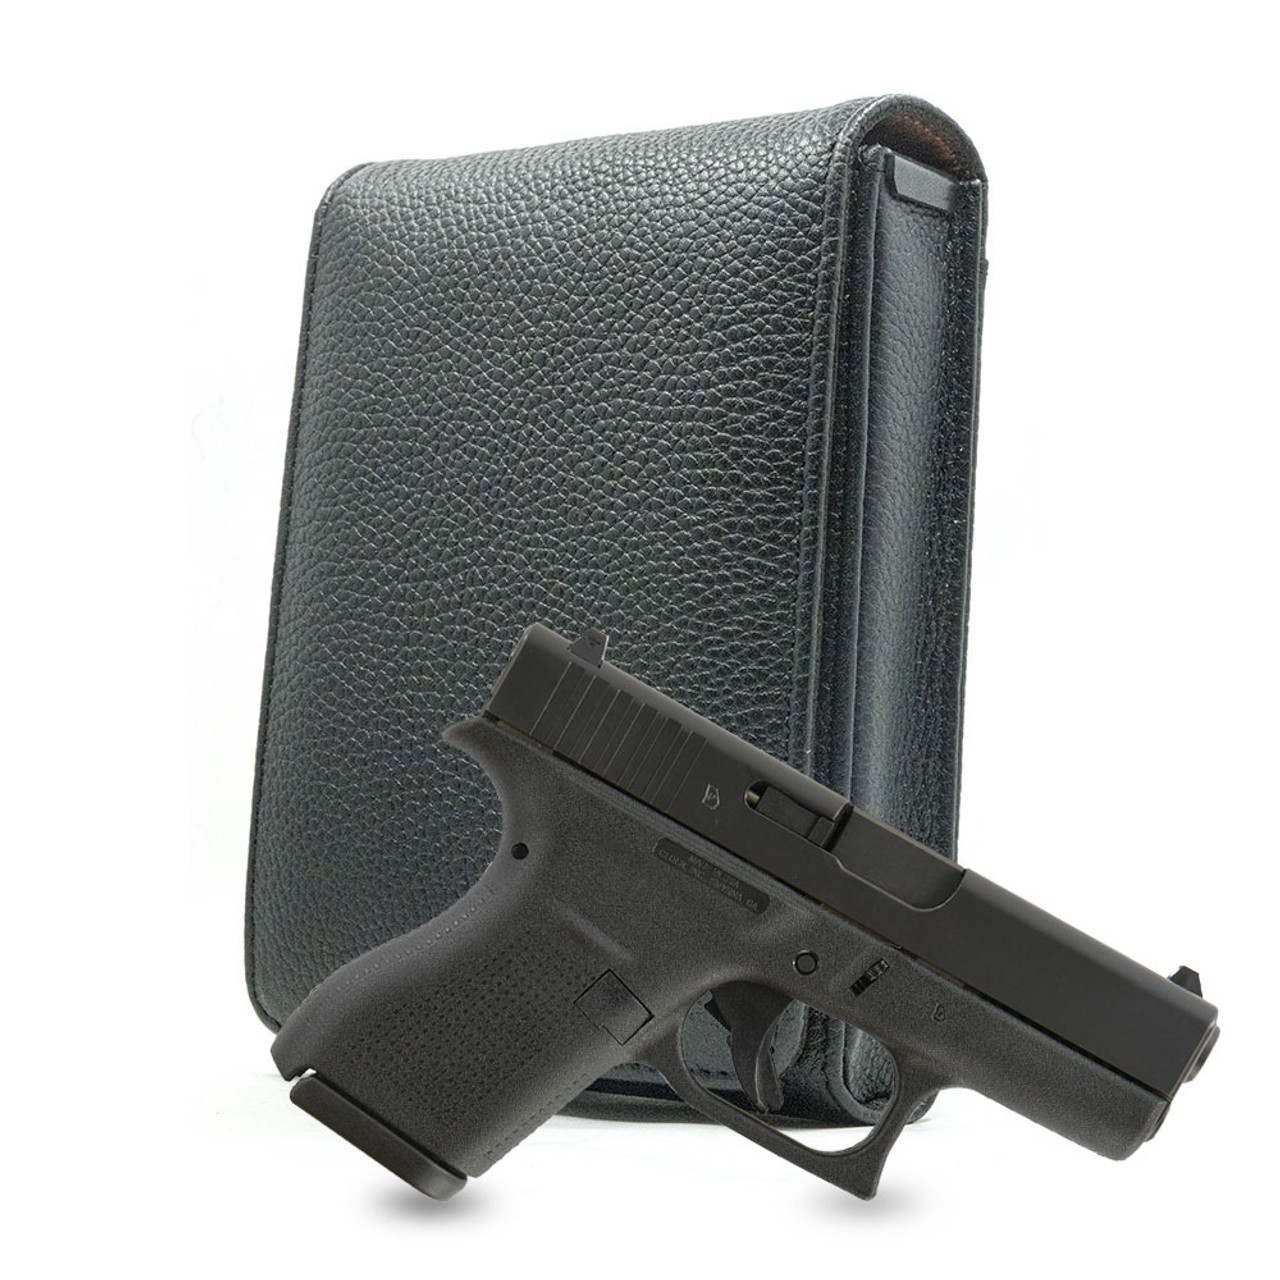 Glock 42 Black Leather Cross Series Holster